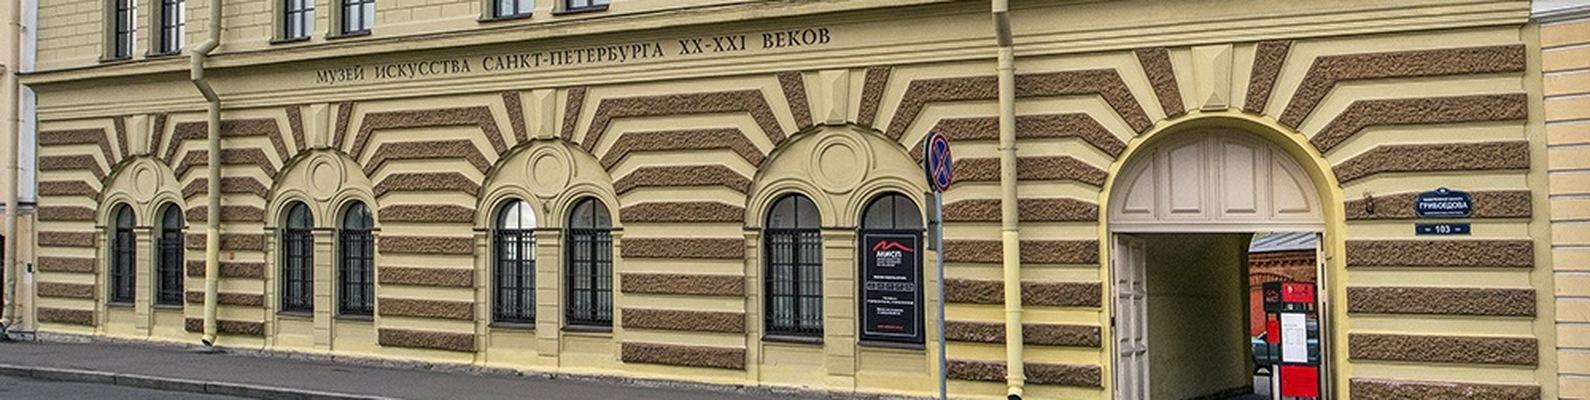 c927b5dfa Музей искусства Санкт-Петербурга XX-XXI веков | ВКонтакте